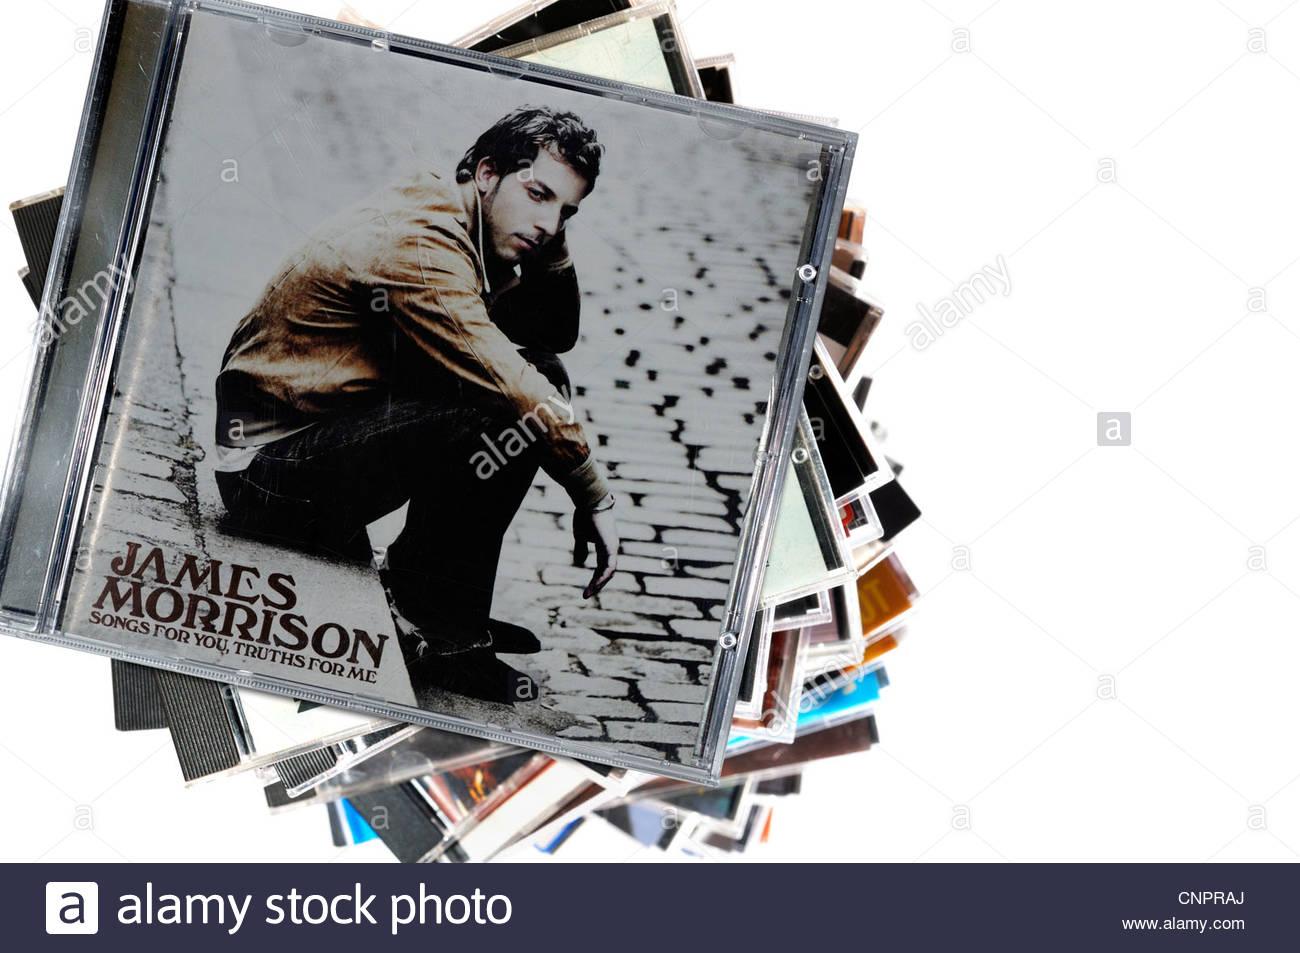 James Morrison album Songs for You Truths for Me, piled music CD